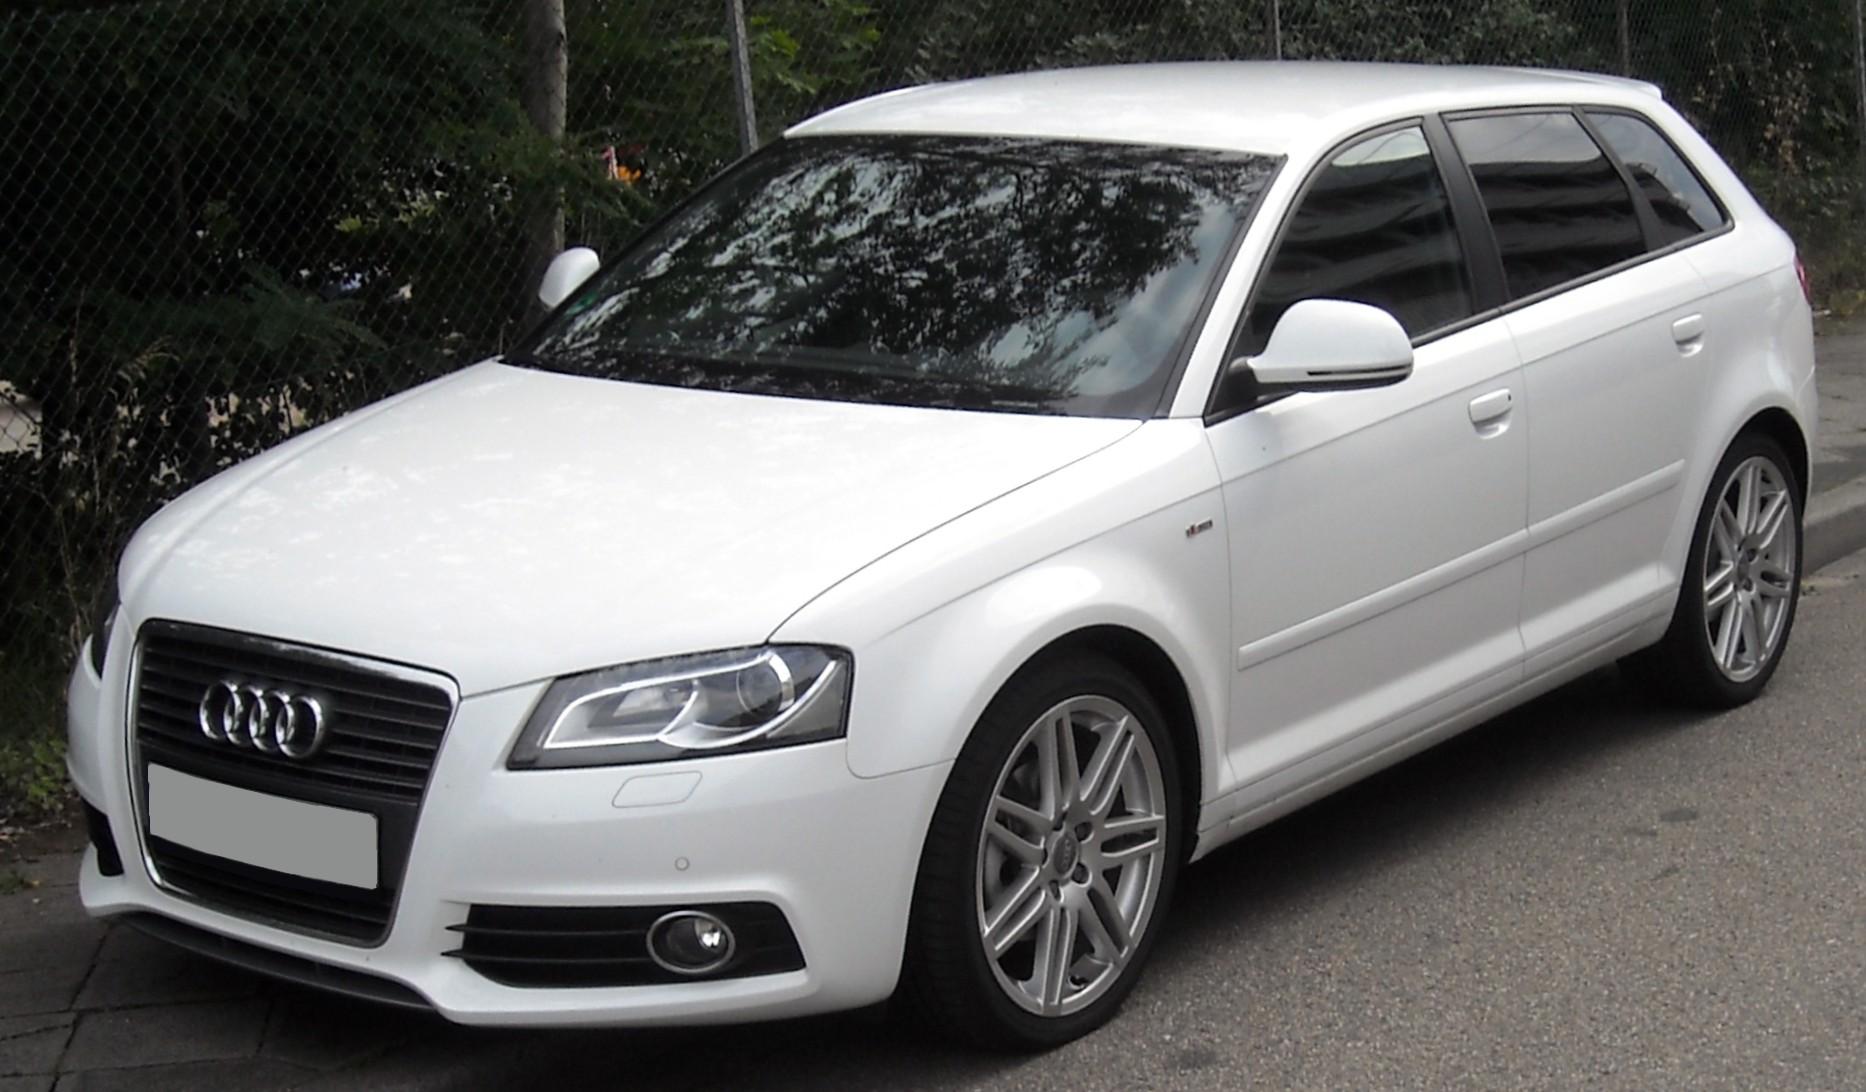 Audi_A3_Sportback_front_20090714